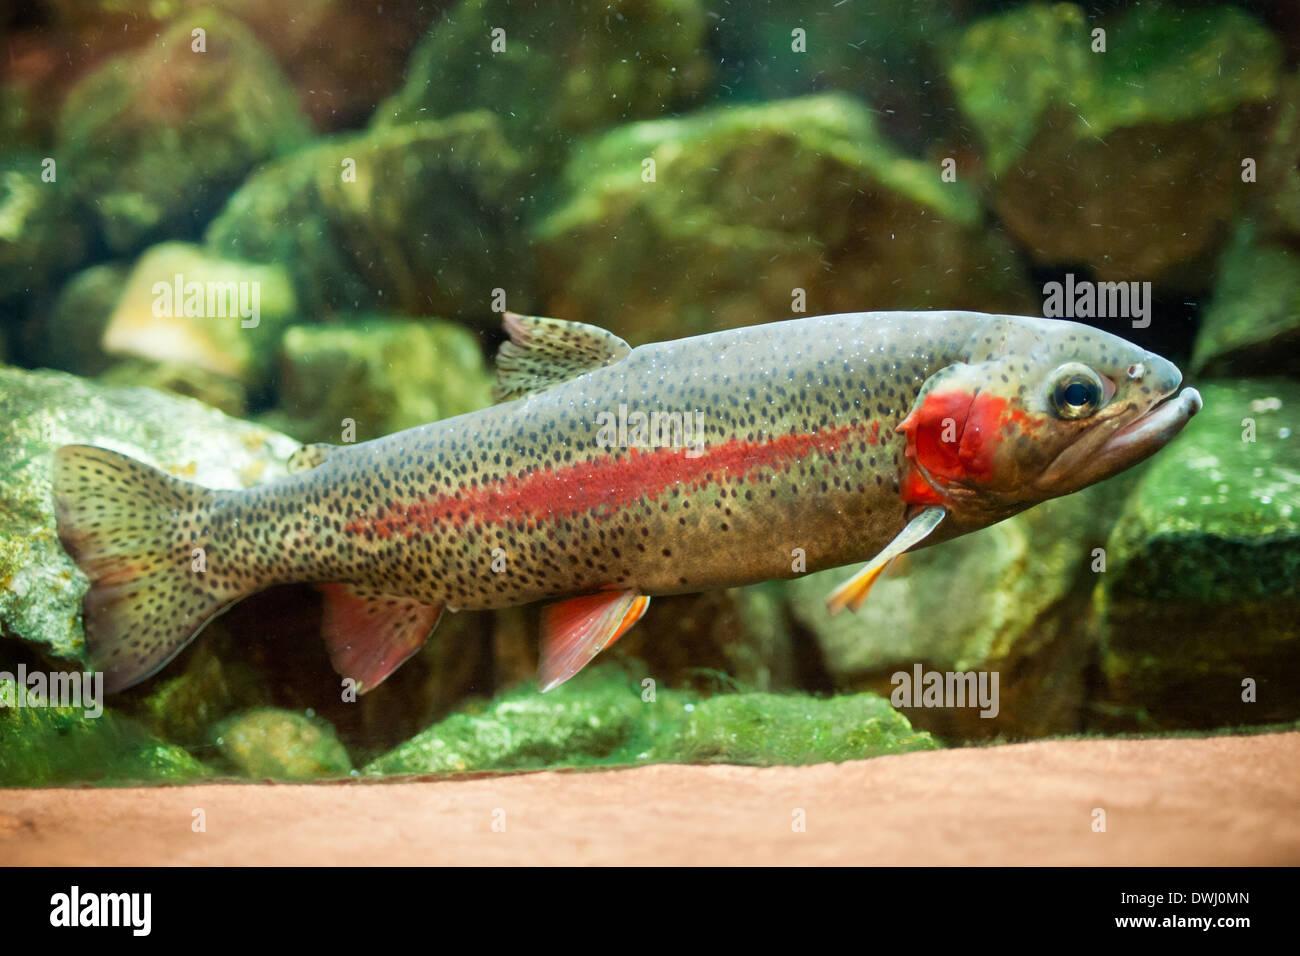 Fish aquarium edmonton - A Male Rainbow Trout Oncorhynchus Mykiss In An Aquarium At The Royal Alberta Museum In Edmonton Alberta Canada